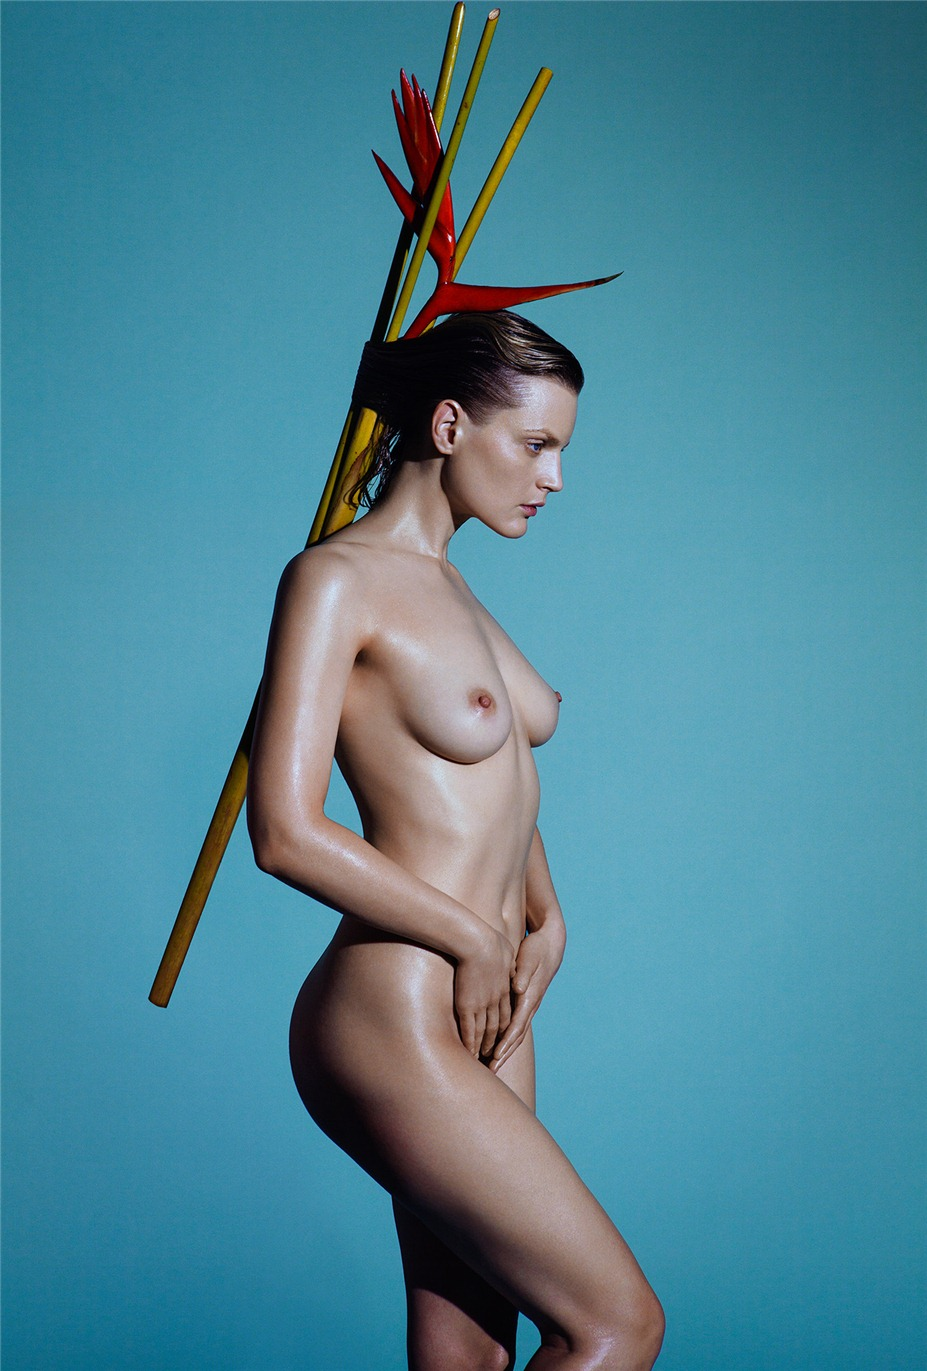 в проекте Естественная красота / Natural Beauty by James Houston